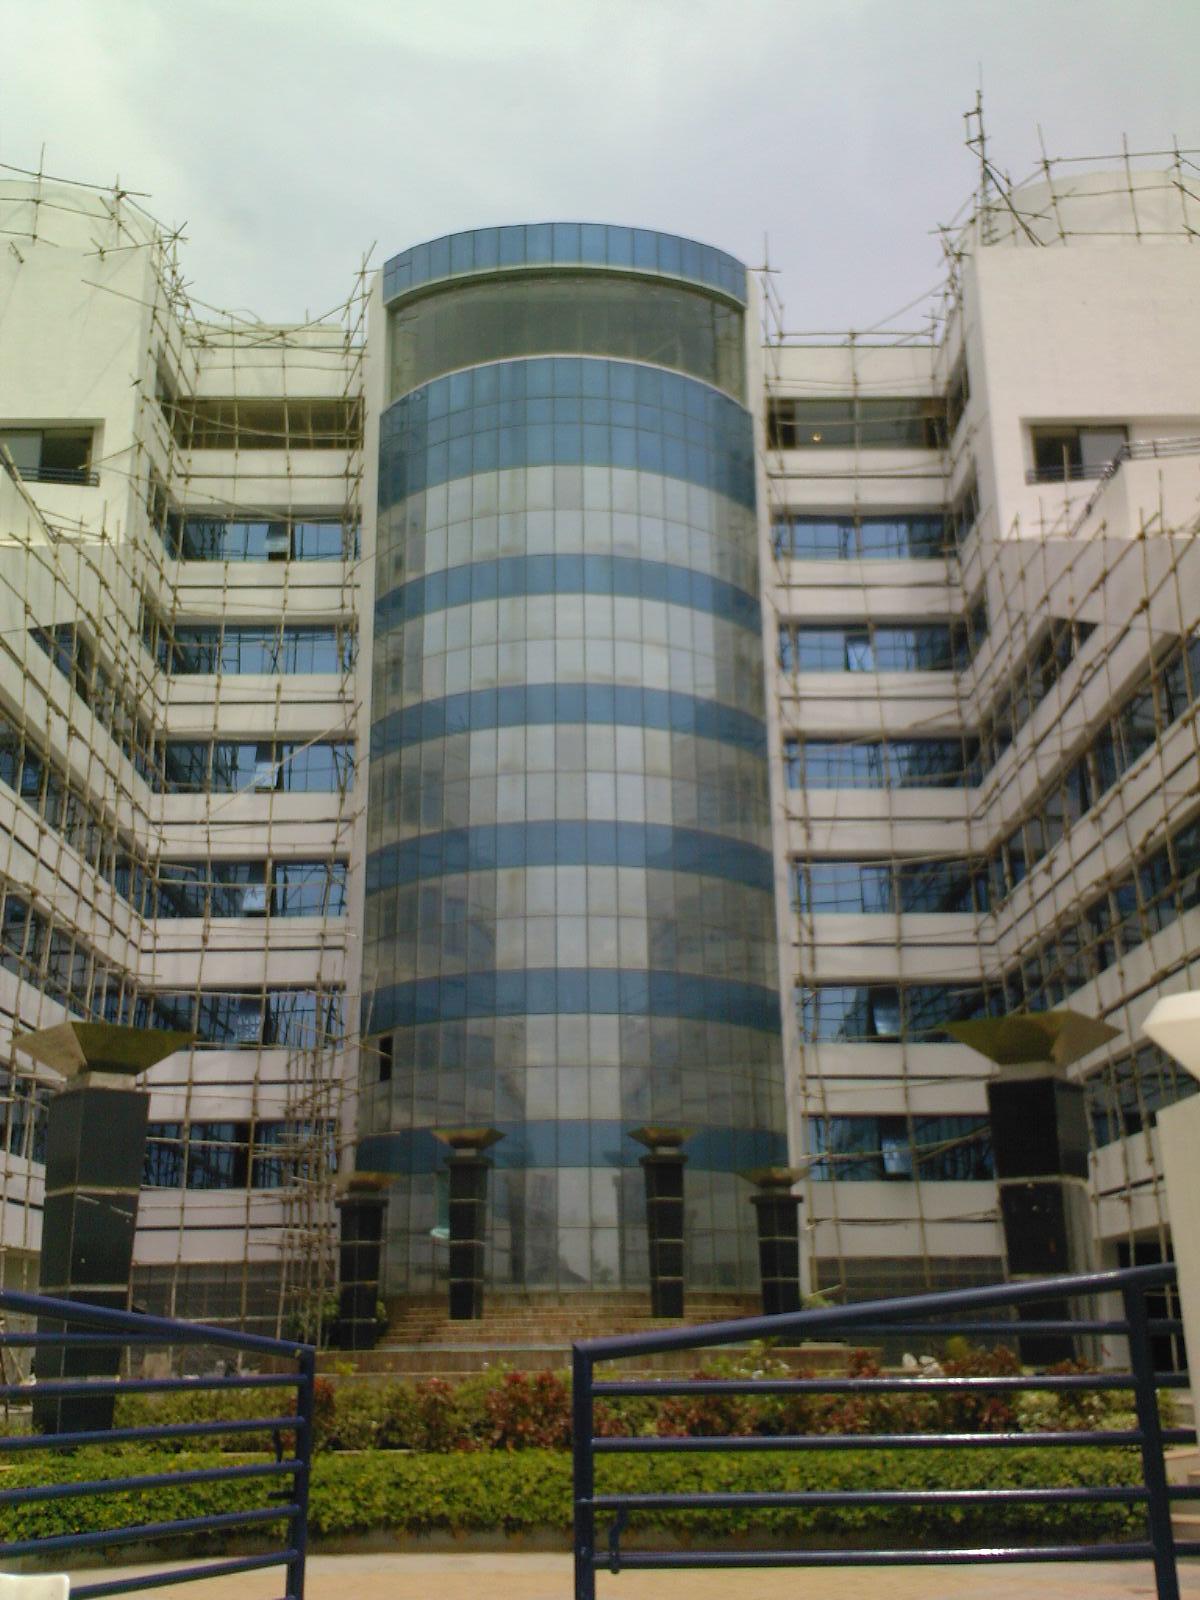 B%2fbc%2frajiv gandhi institute of technology%2c mumbai